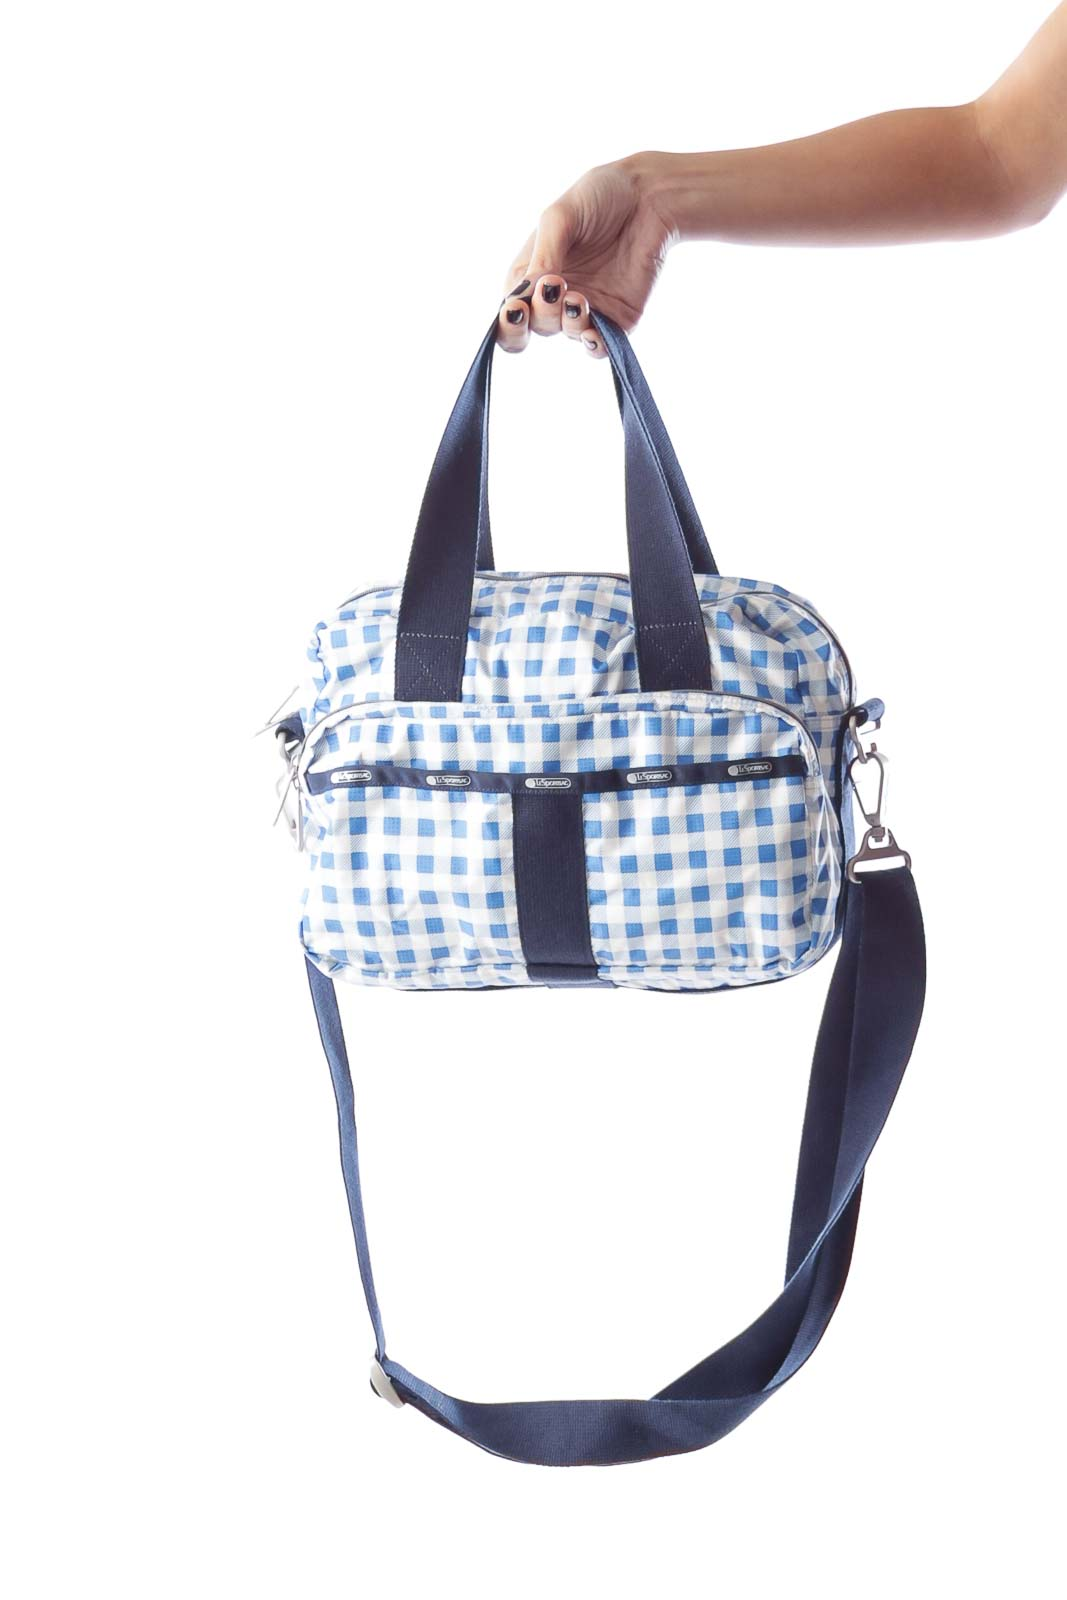 Blue & White Plaid Crossbody Bag